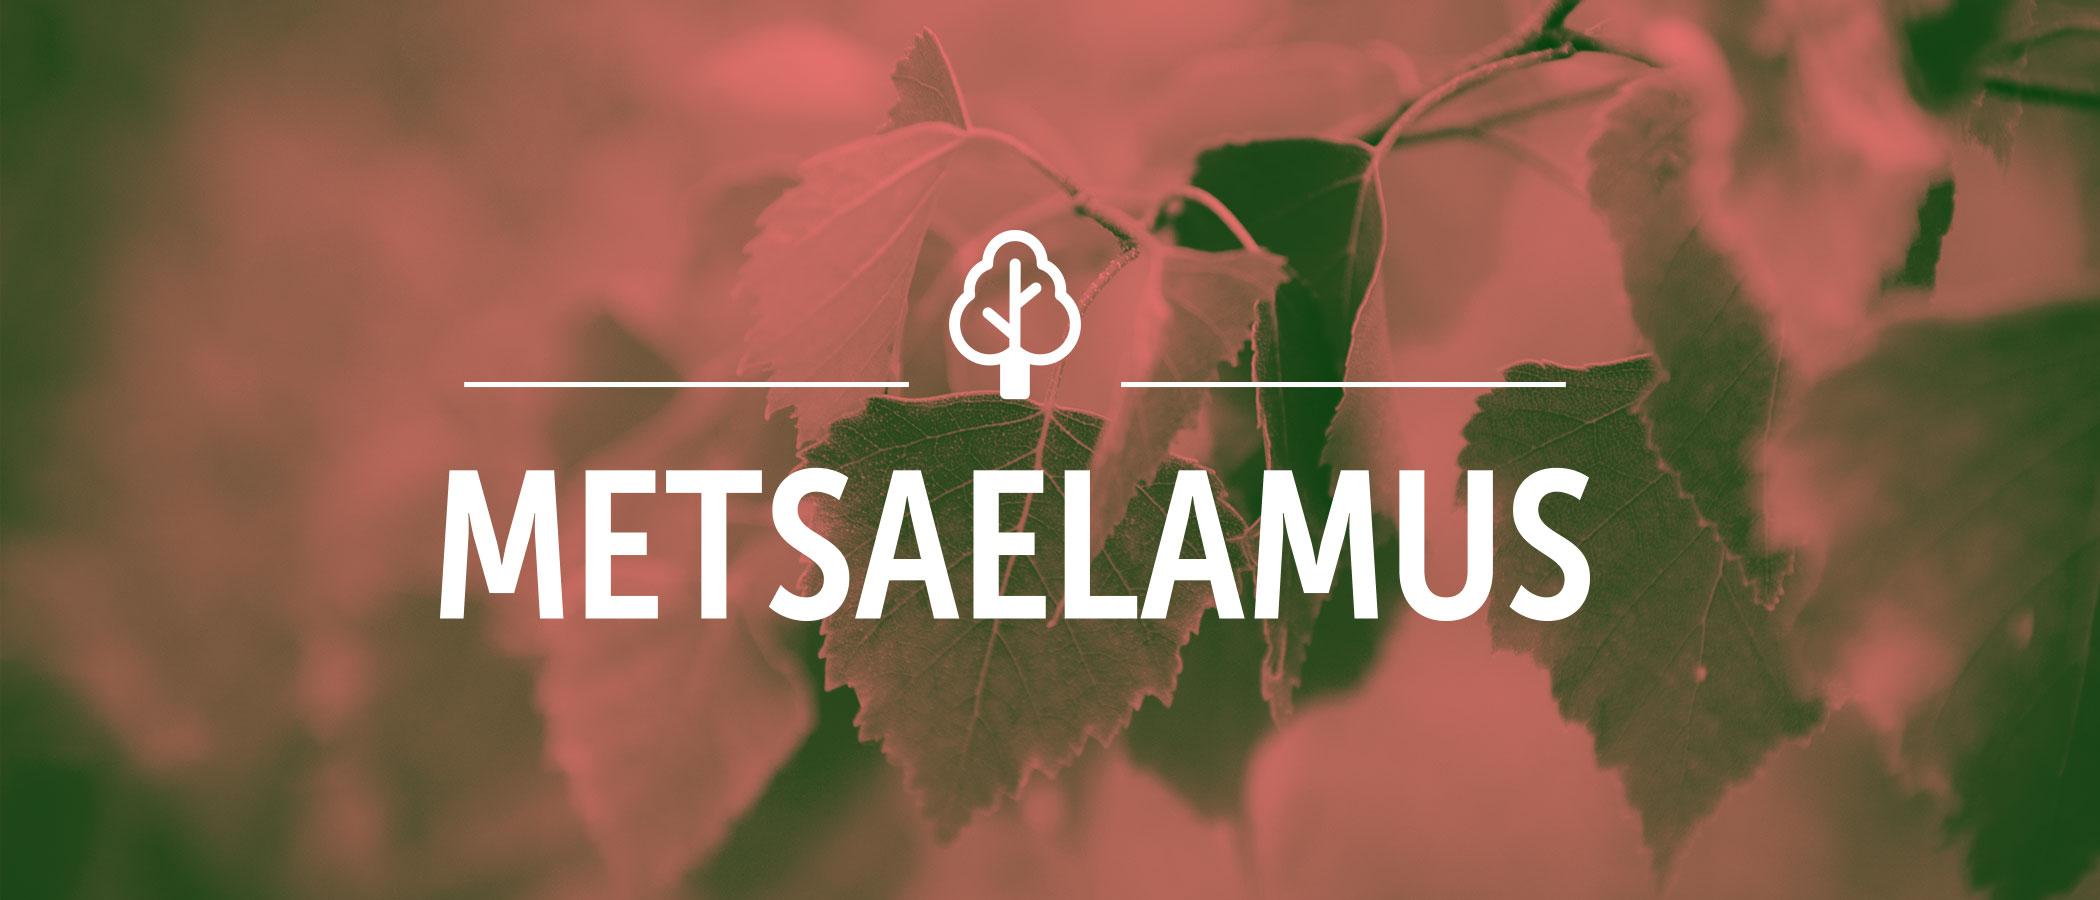 Metsaelamus_logo_Vutscom